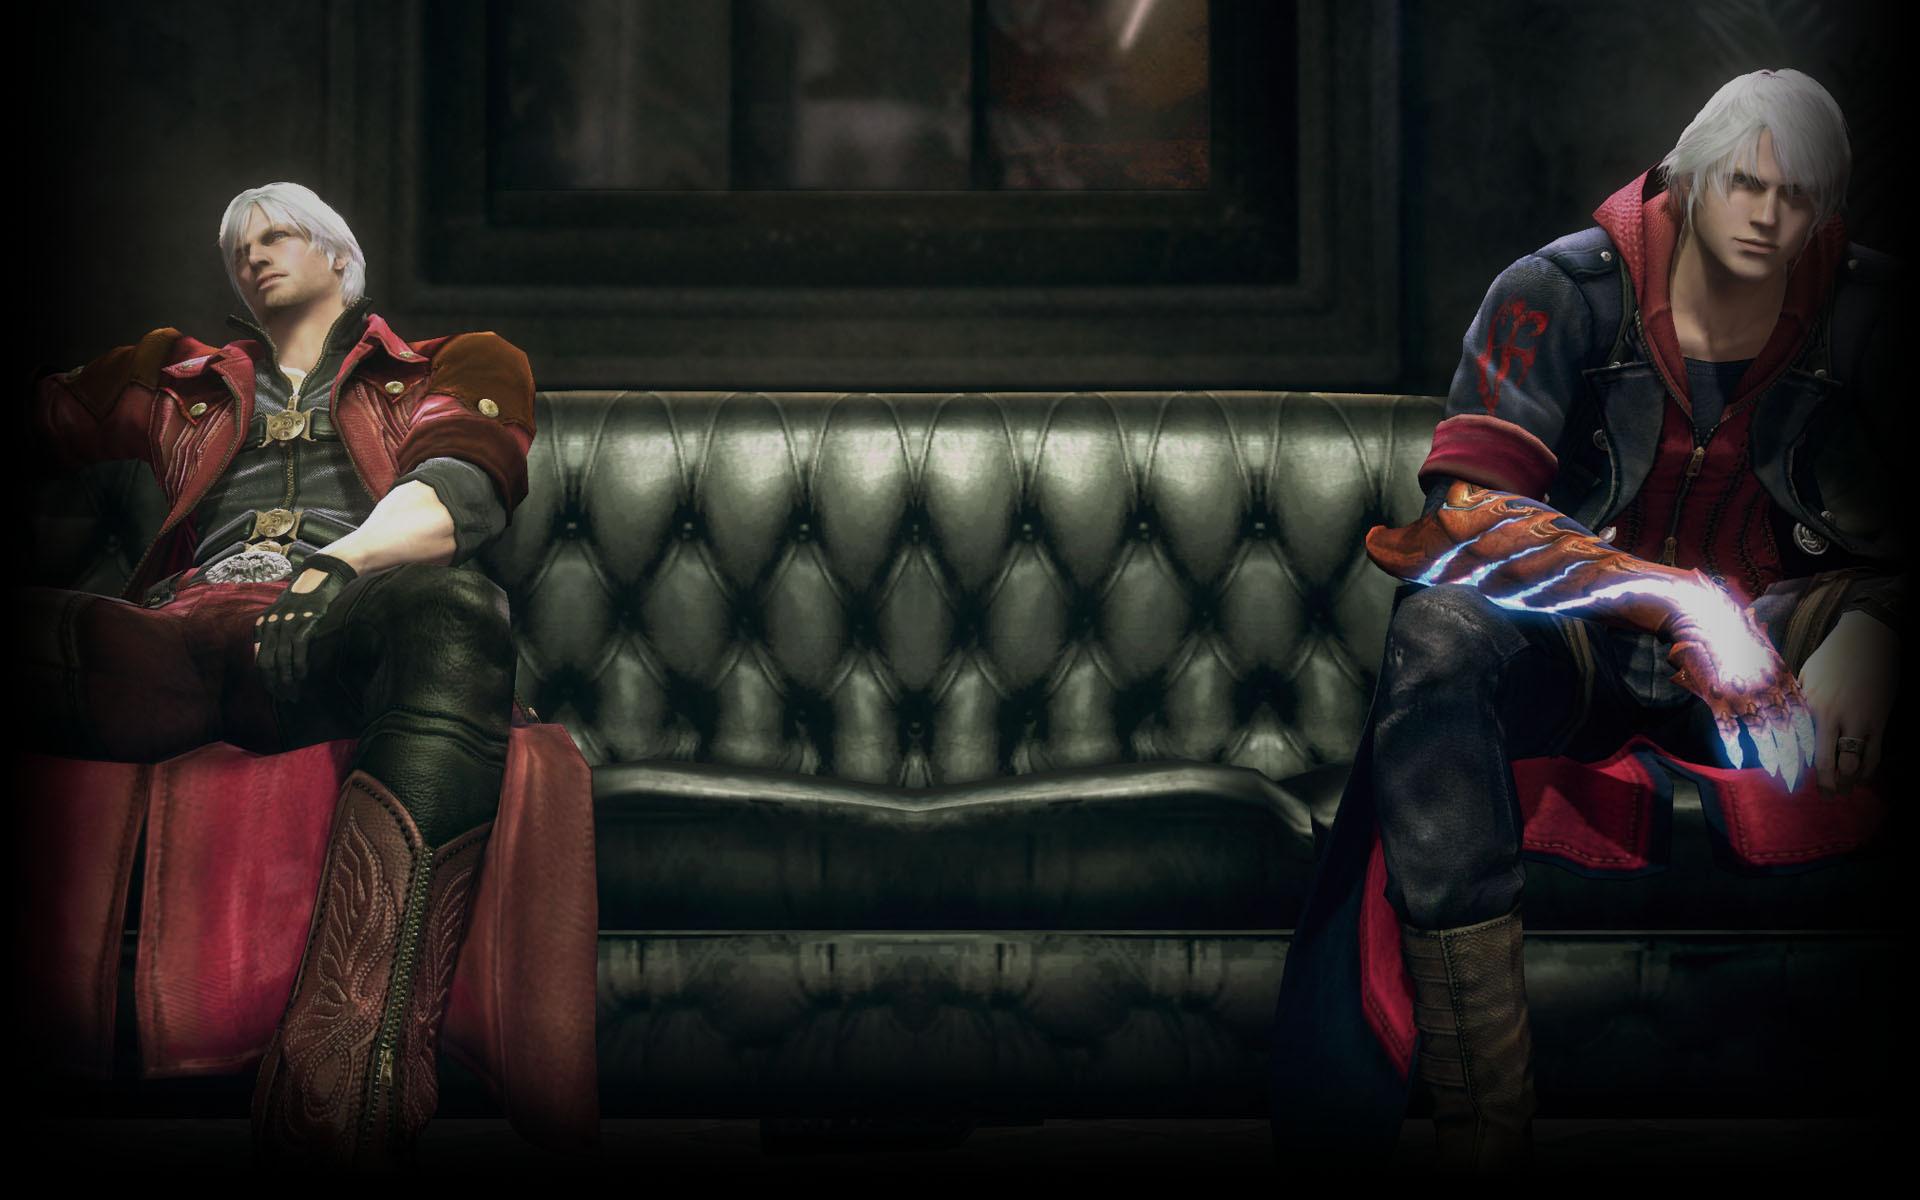 Devil May Cry 4 Wallpaper: Devil May Cry 4 HD Wallpaper